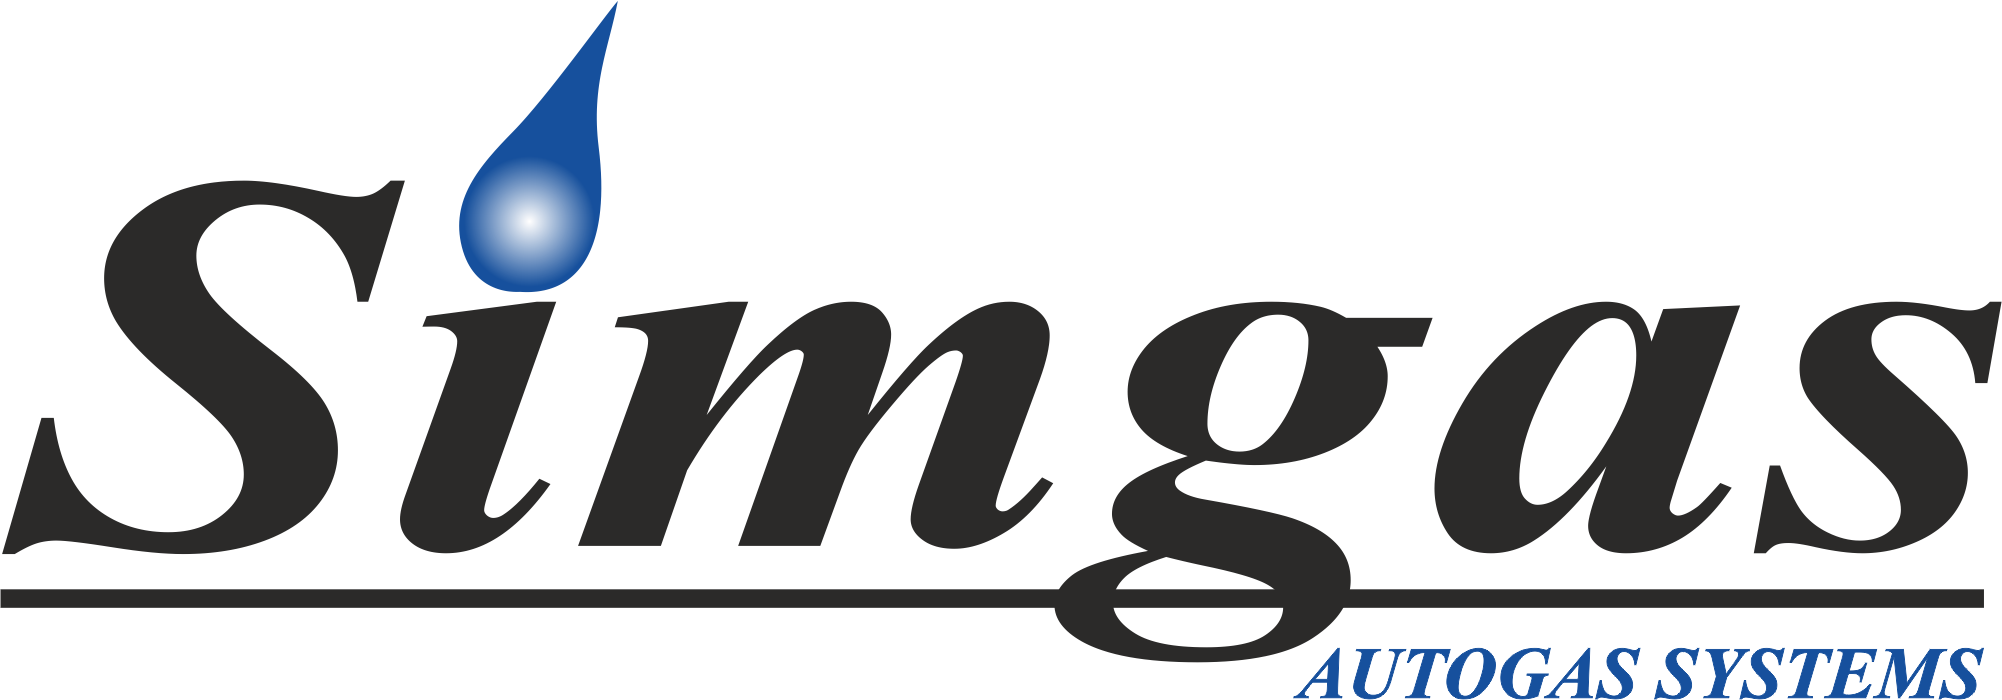 Газов инжекцион Stargas – Simgas